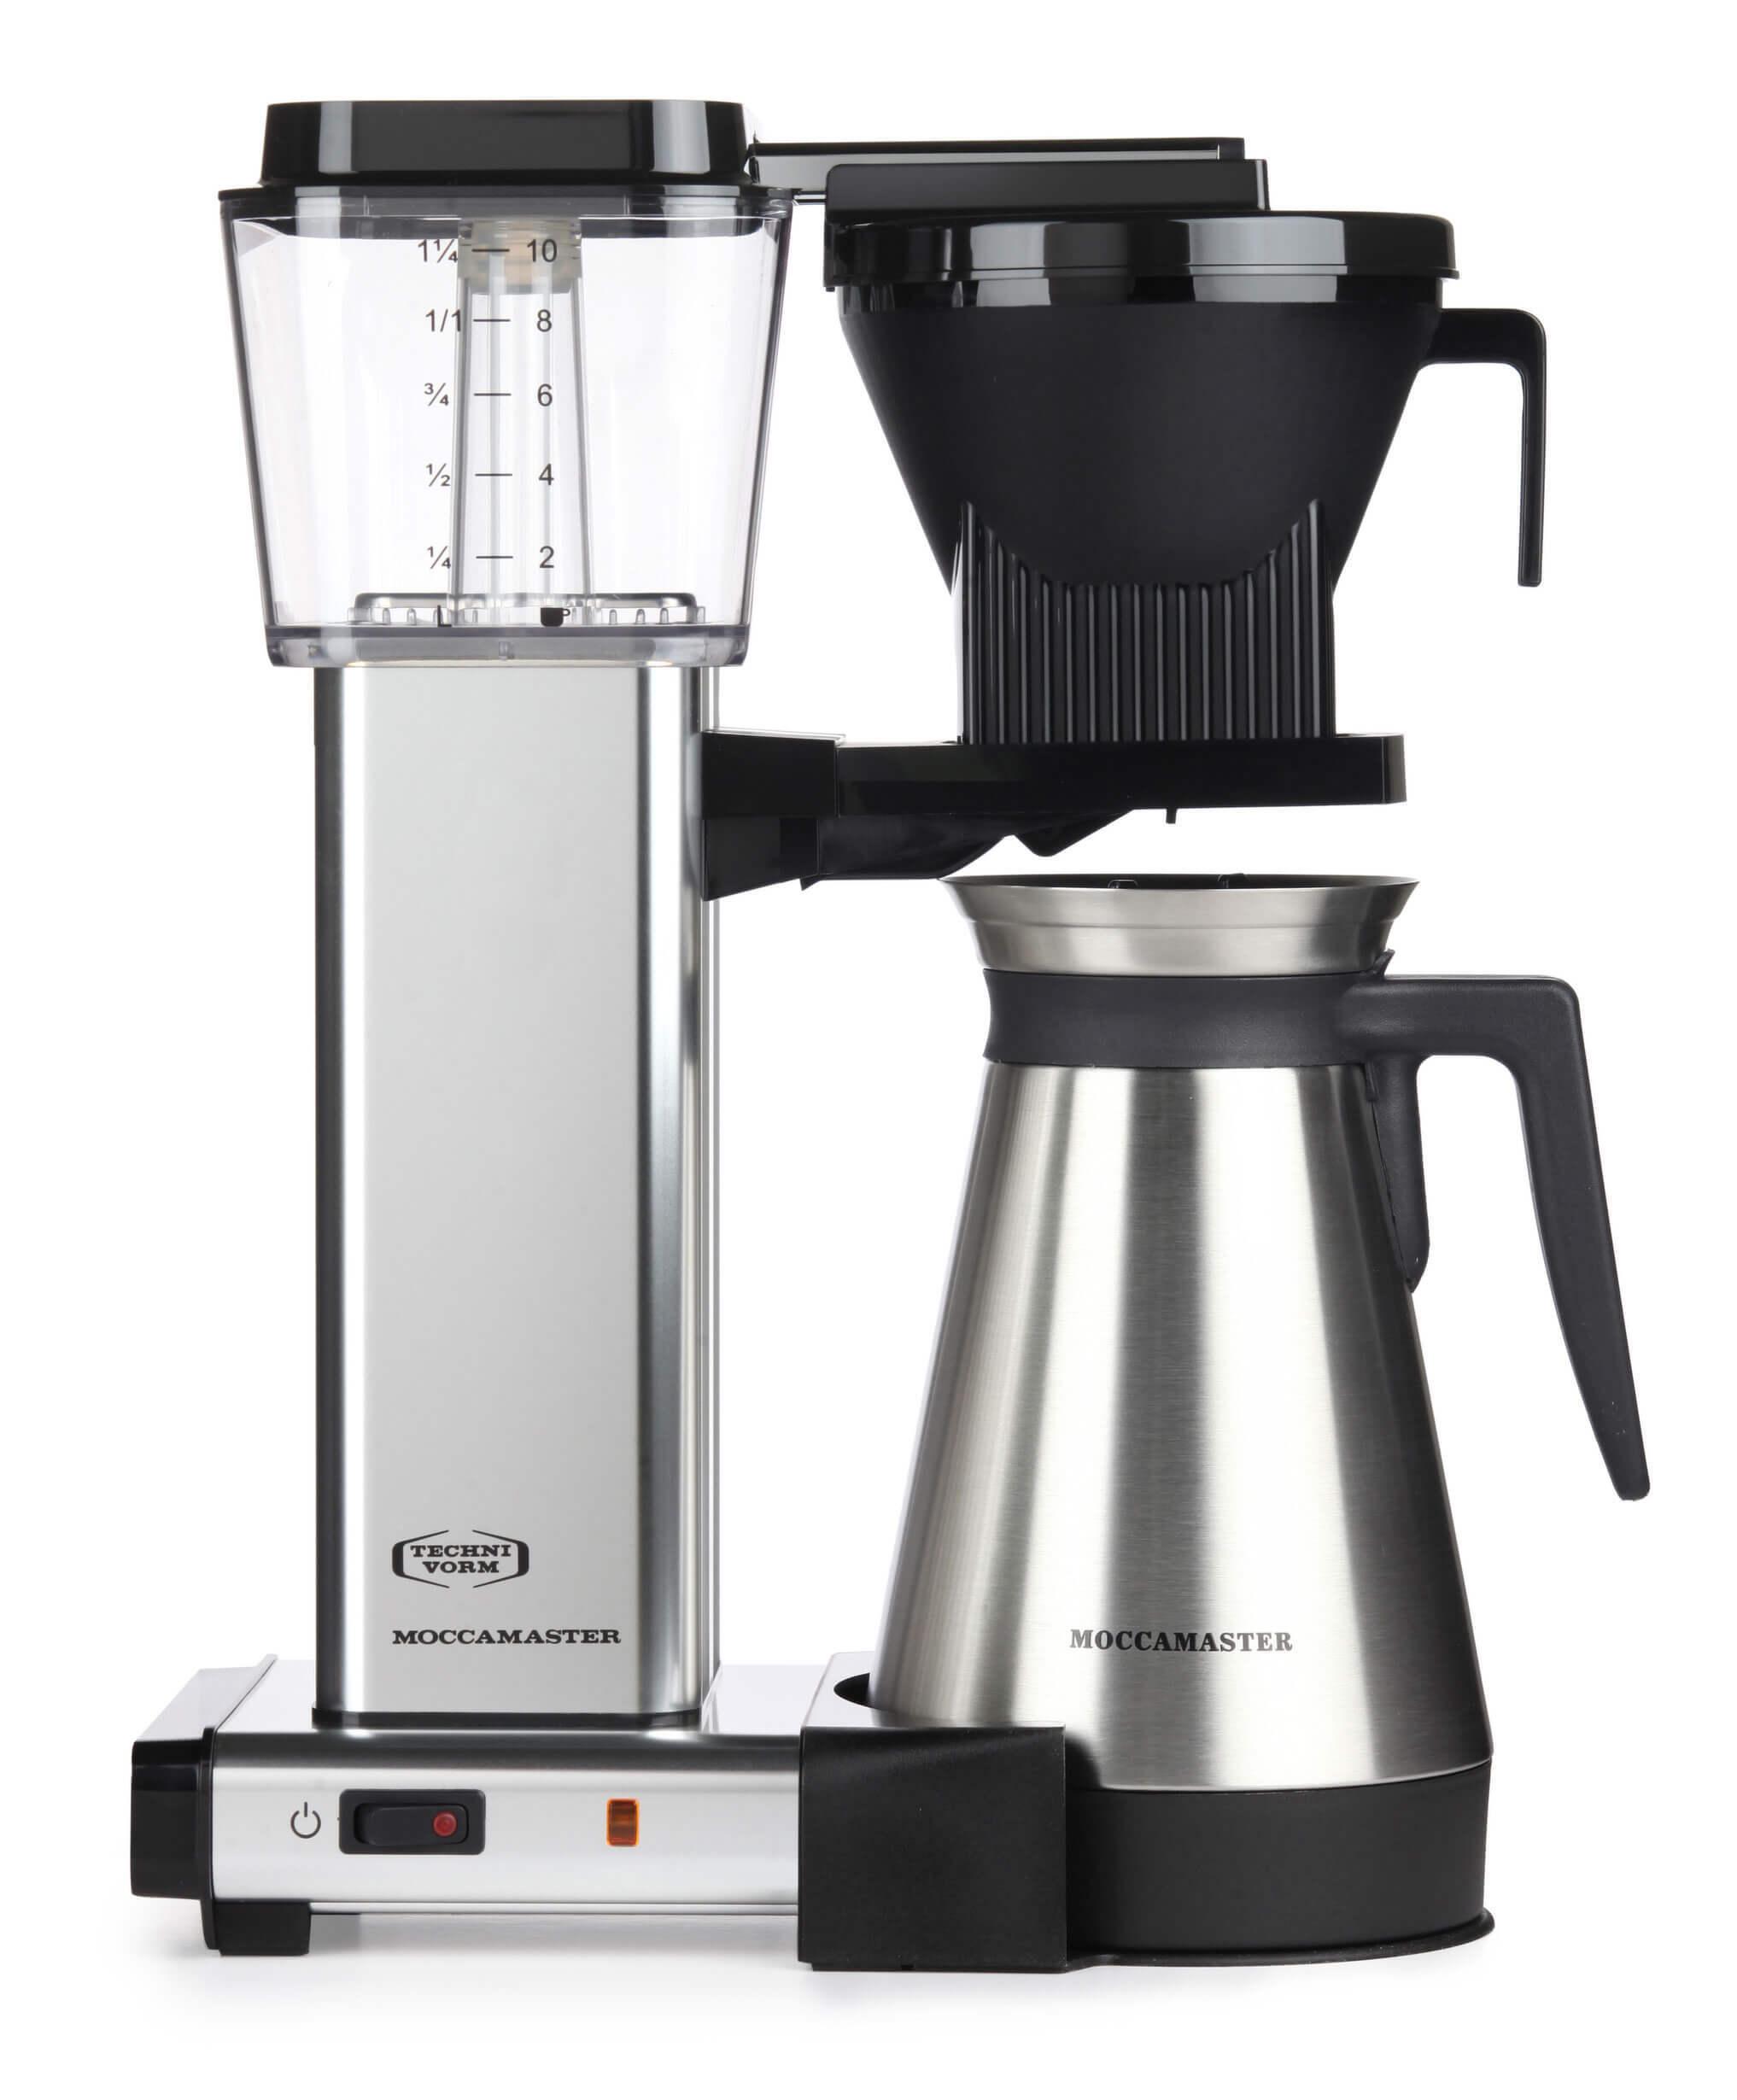 Moccamaster Kaffeeautomat KBGT 741 Thermo polished | Kamasega